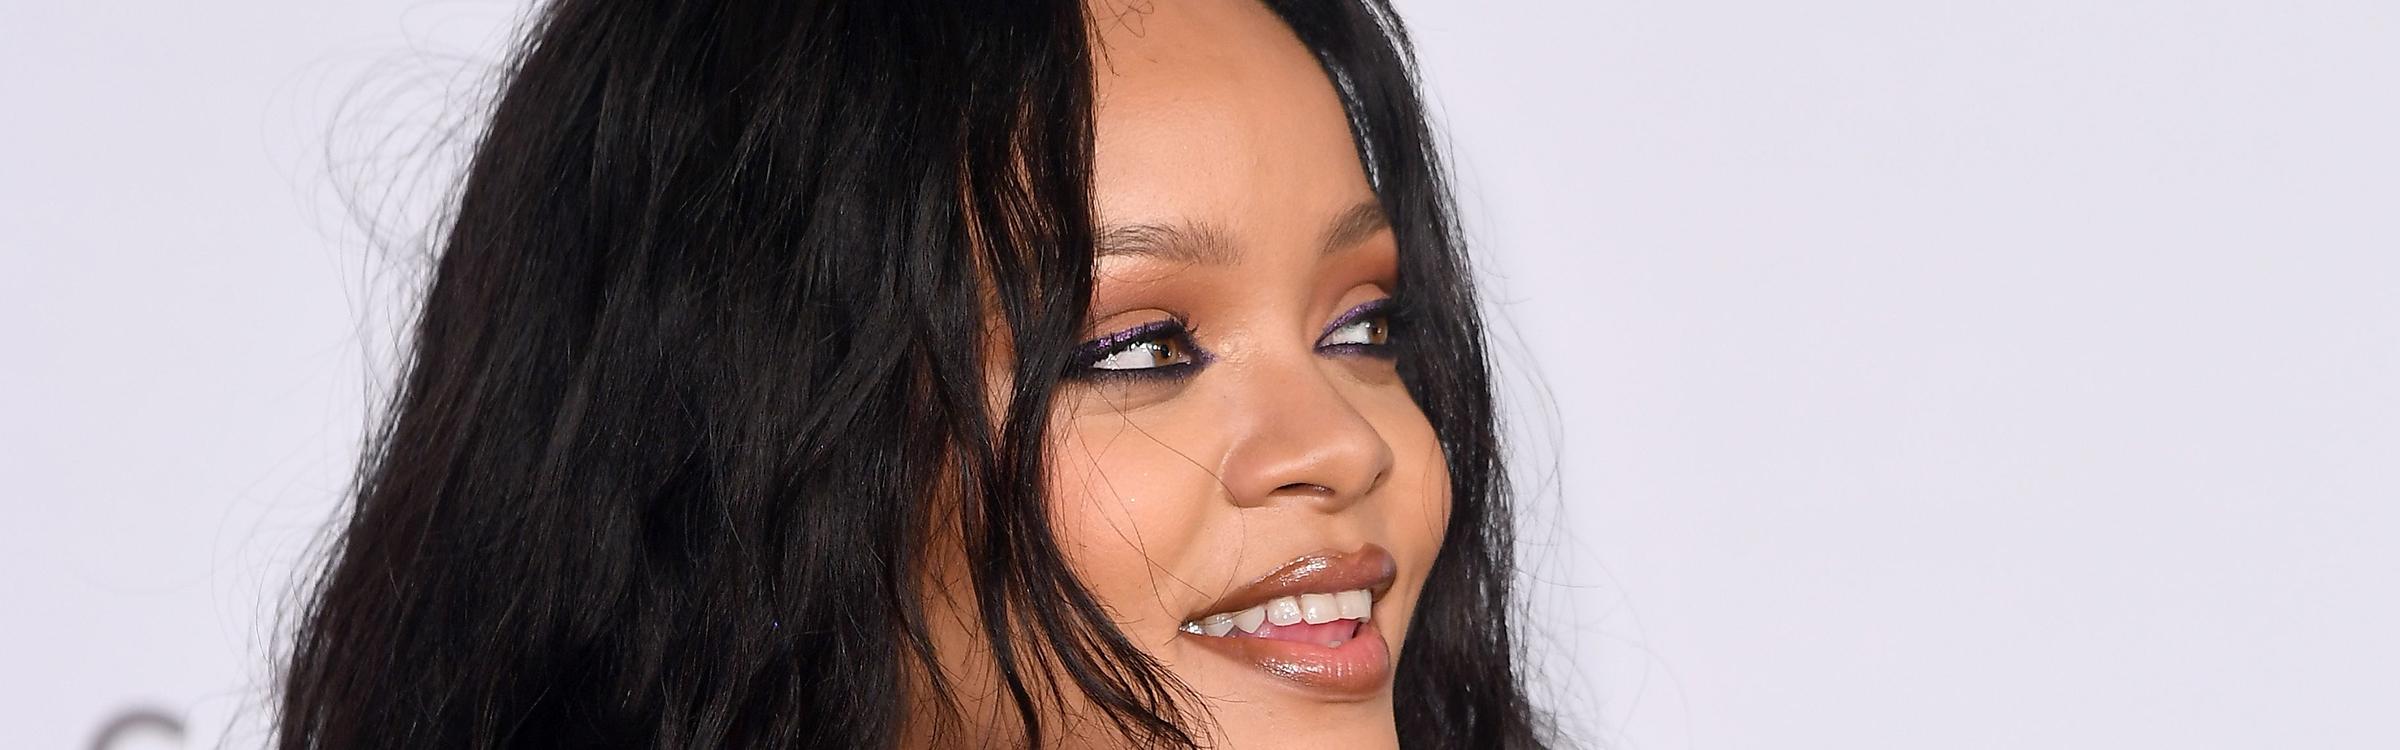 Rihannaheader